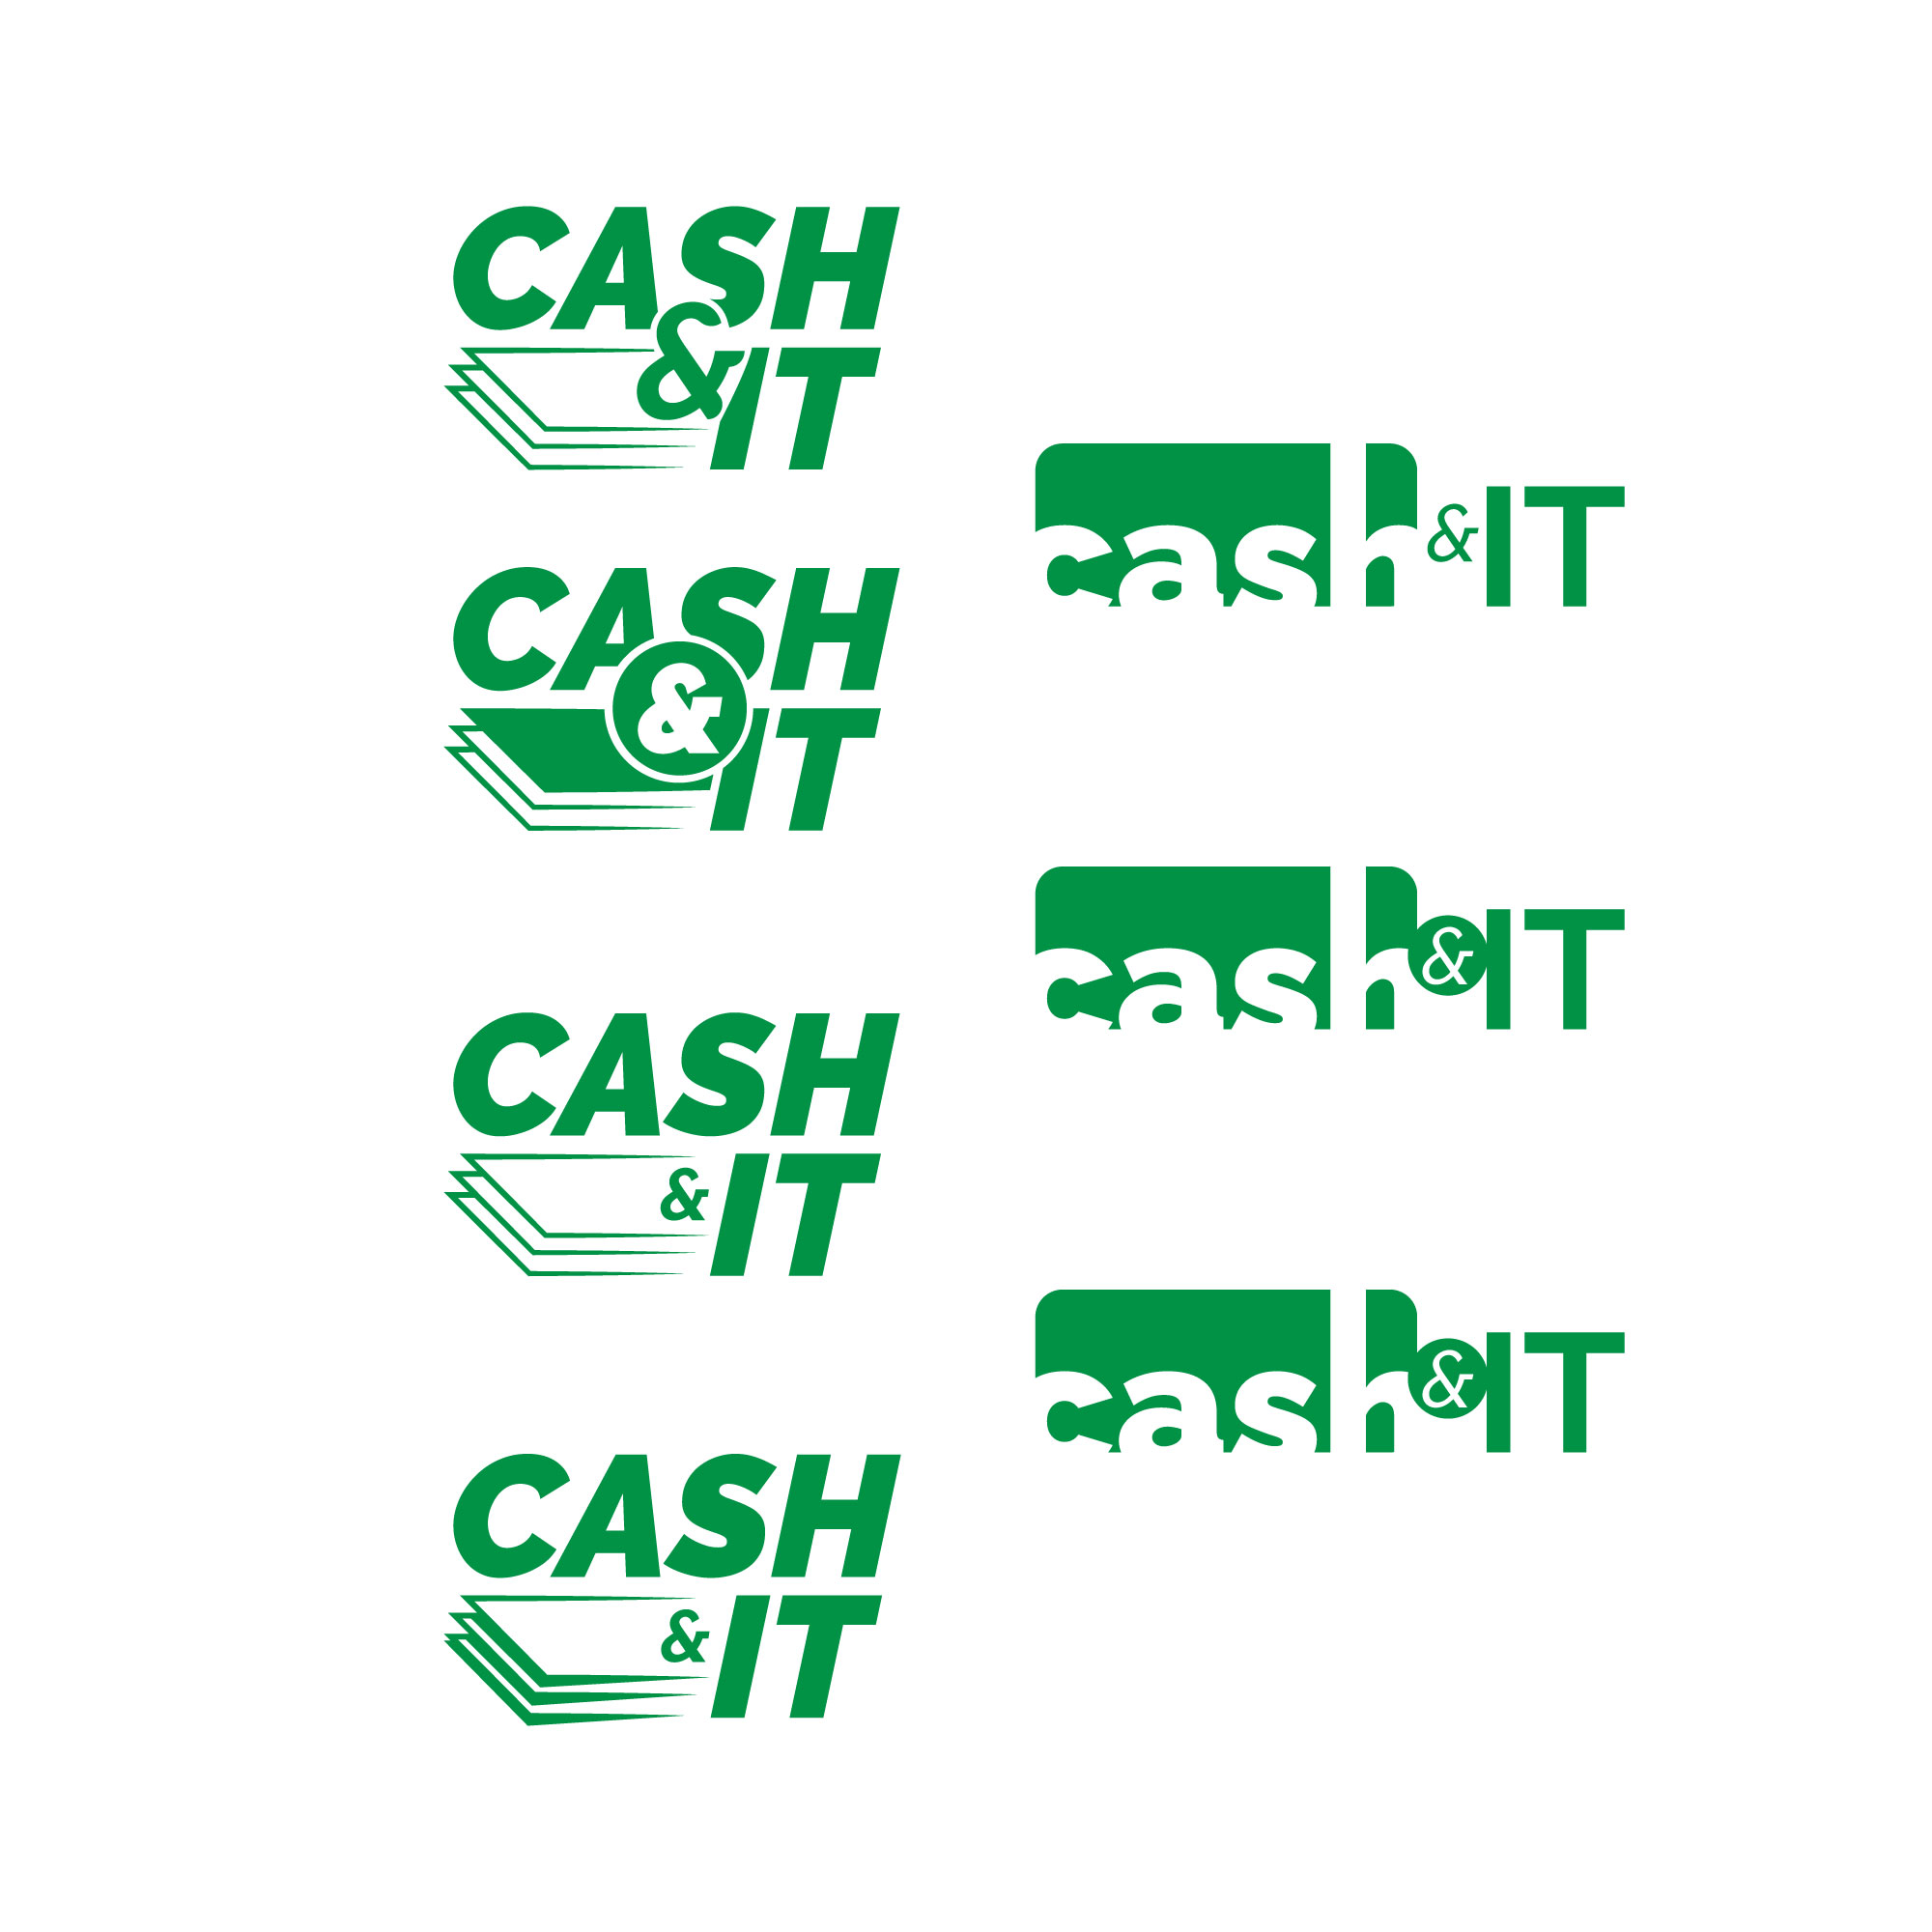 Логотип для Cash & IT - сервис доставки денег фото f_3105fdeb7faa72b3.jpg